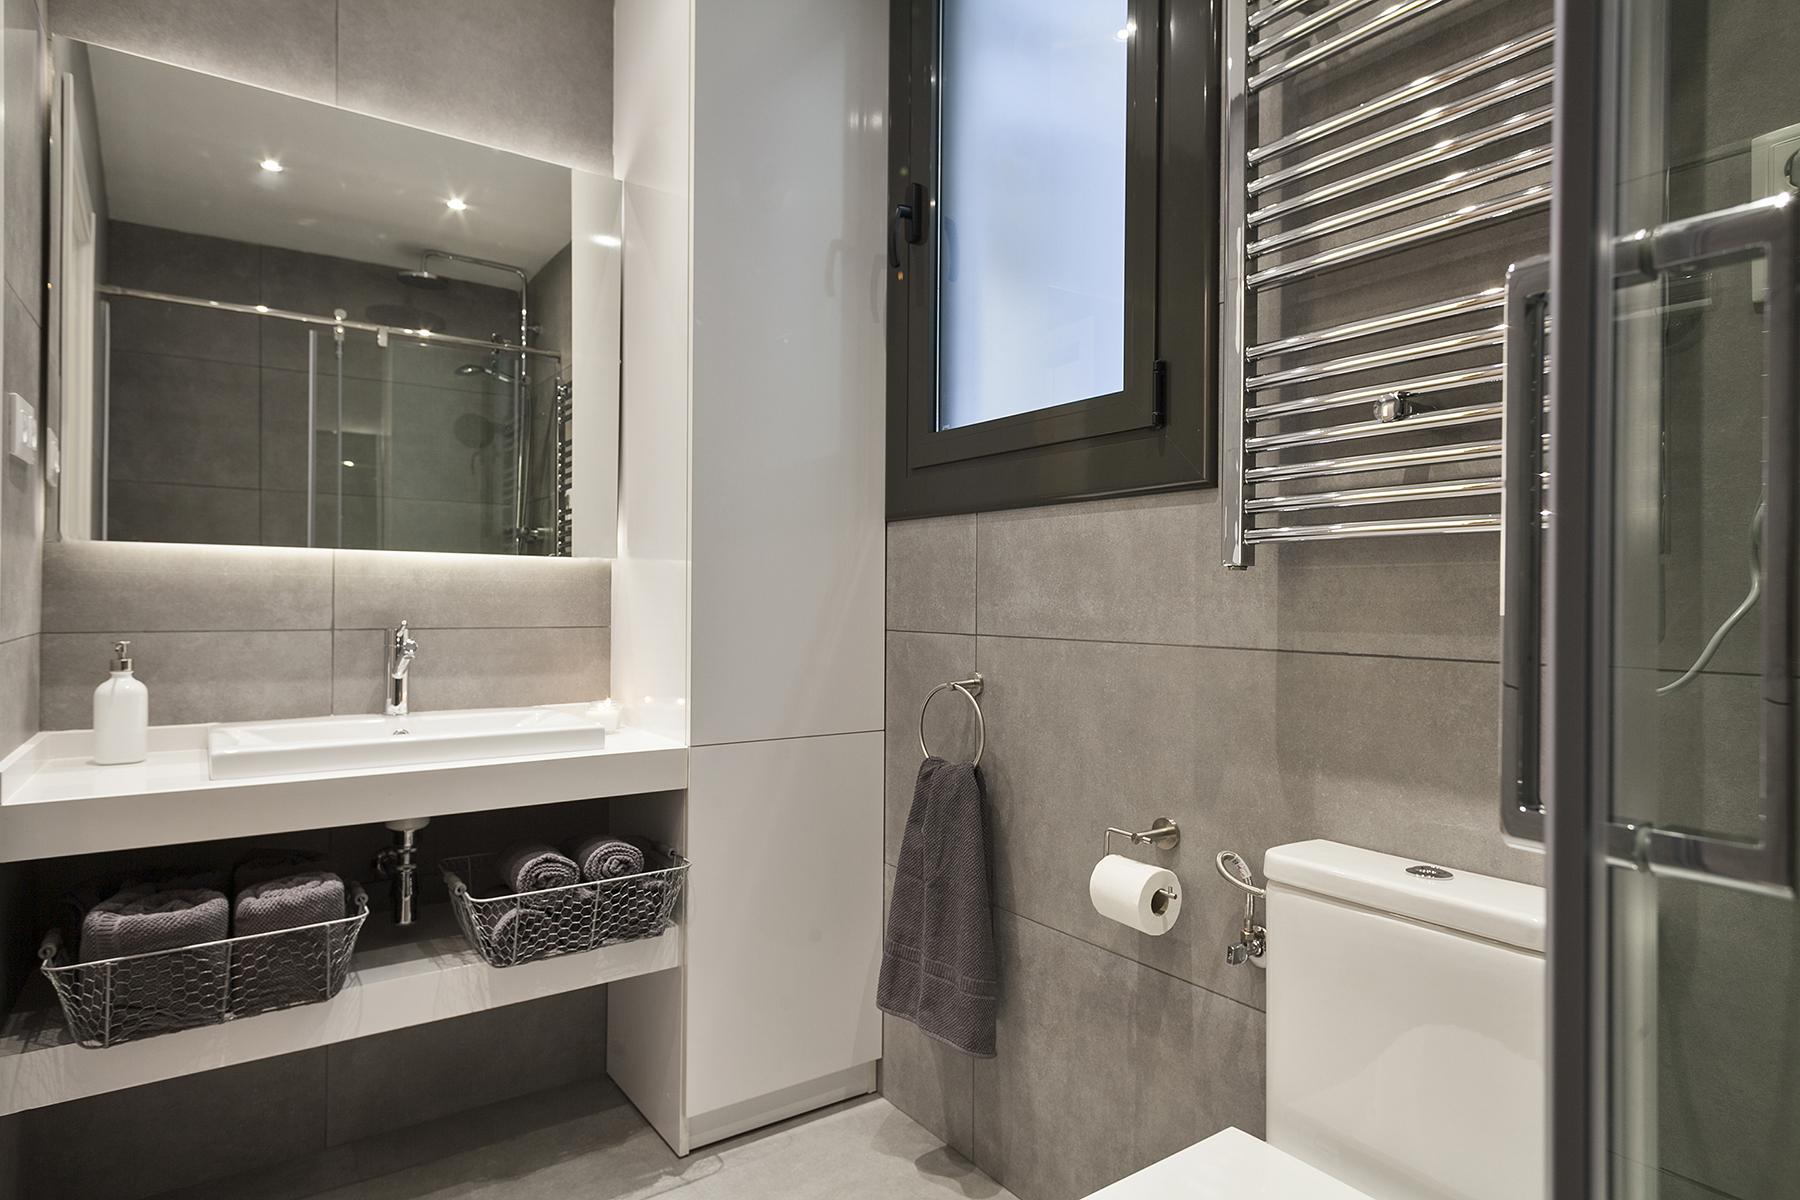 Alquiler apartamento vacacional Barcelona